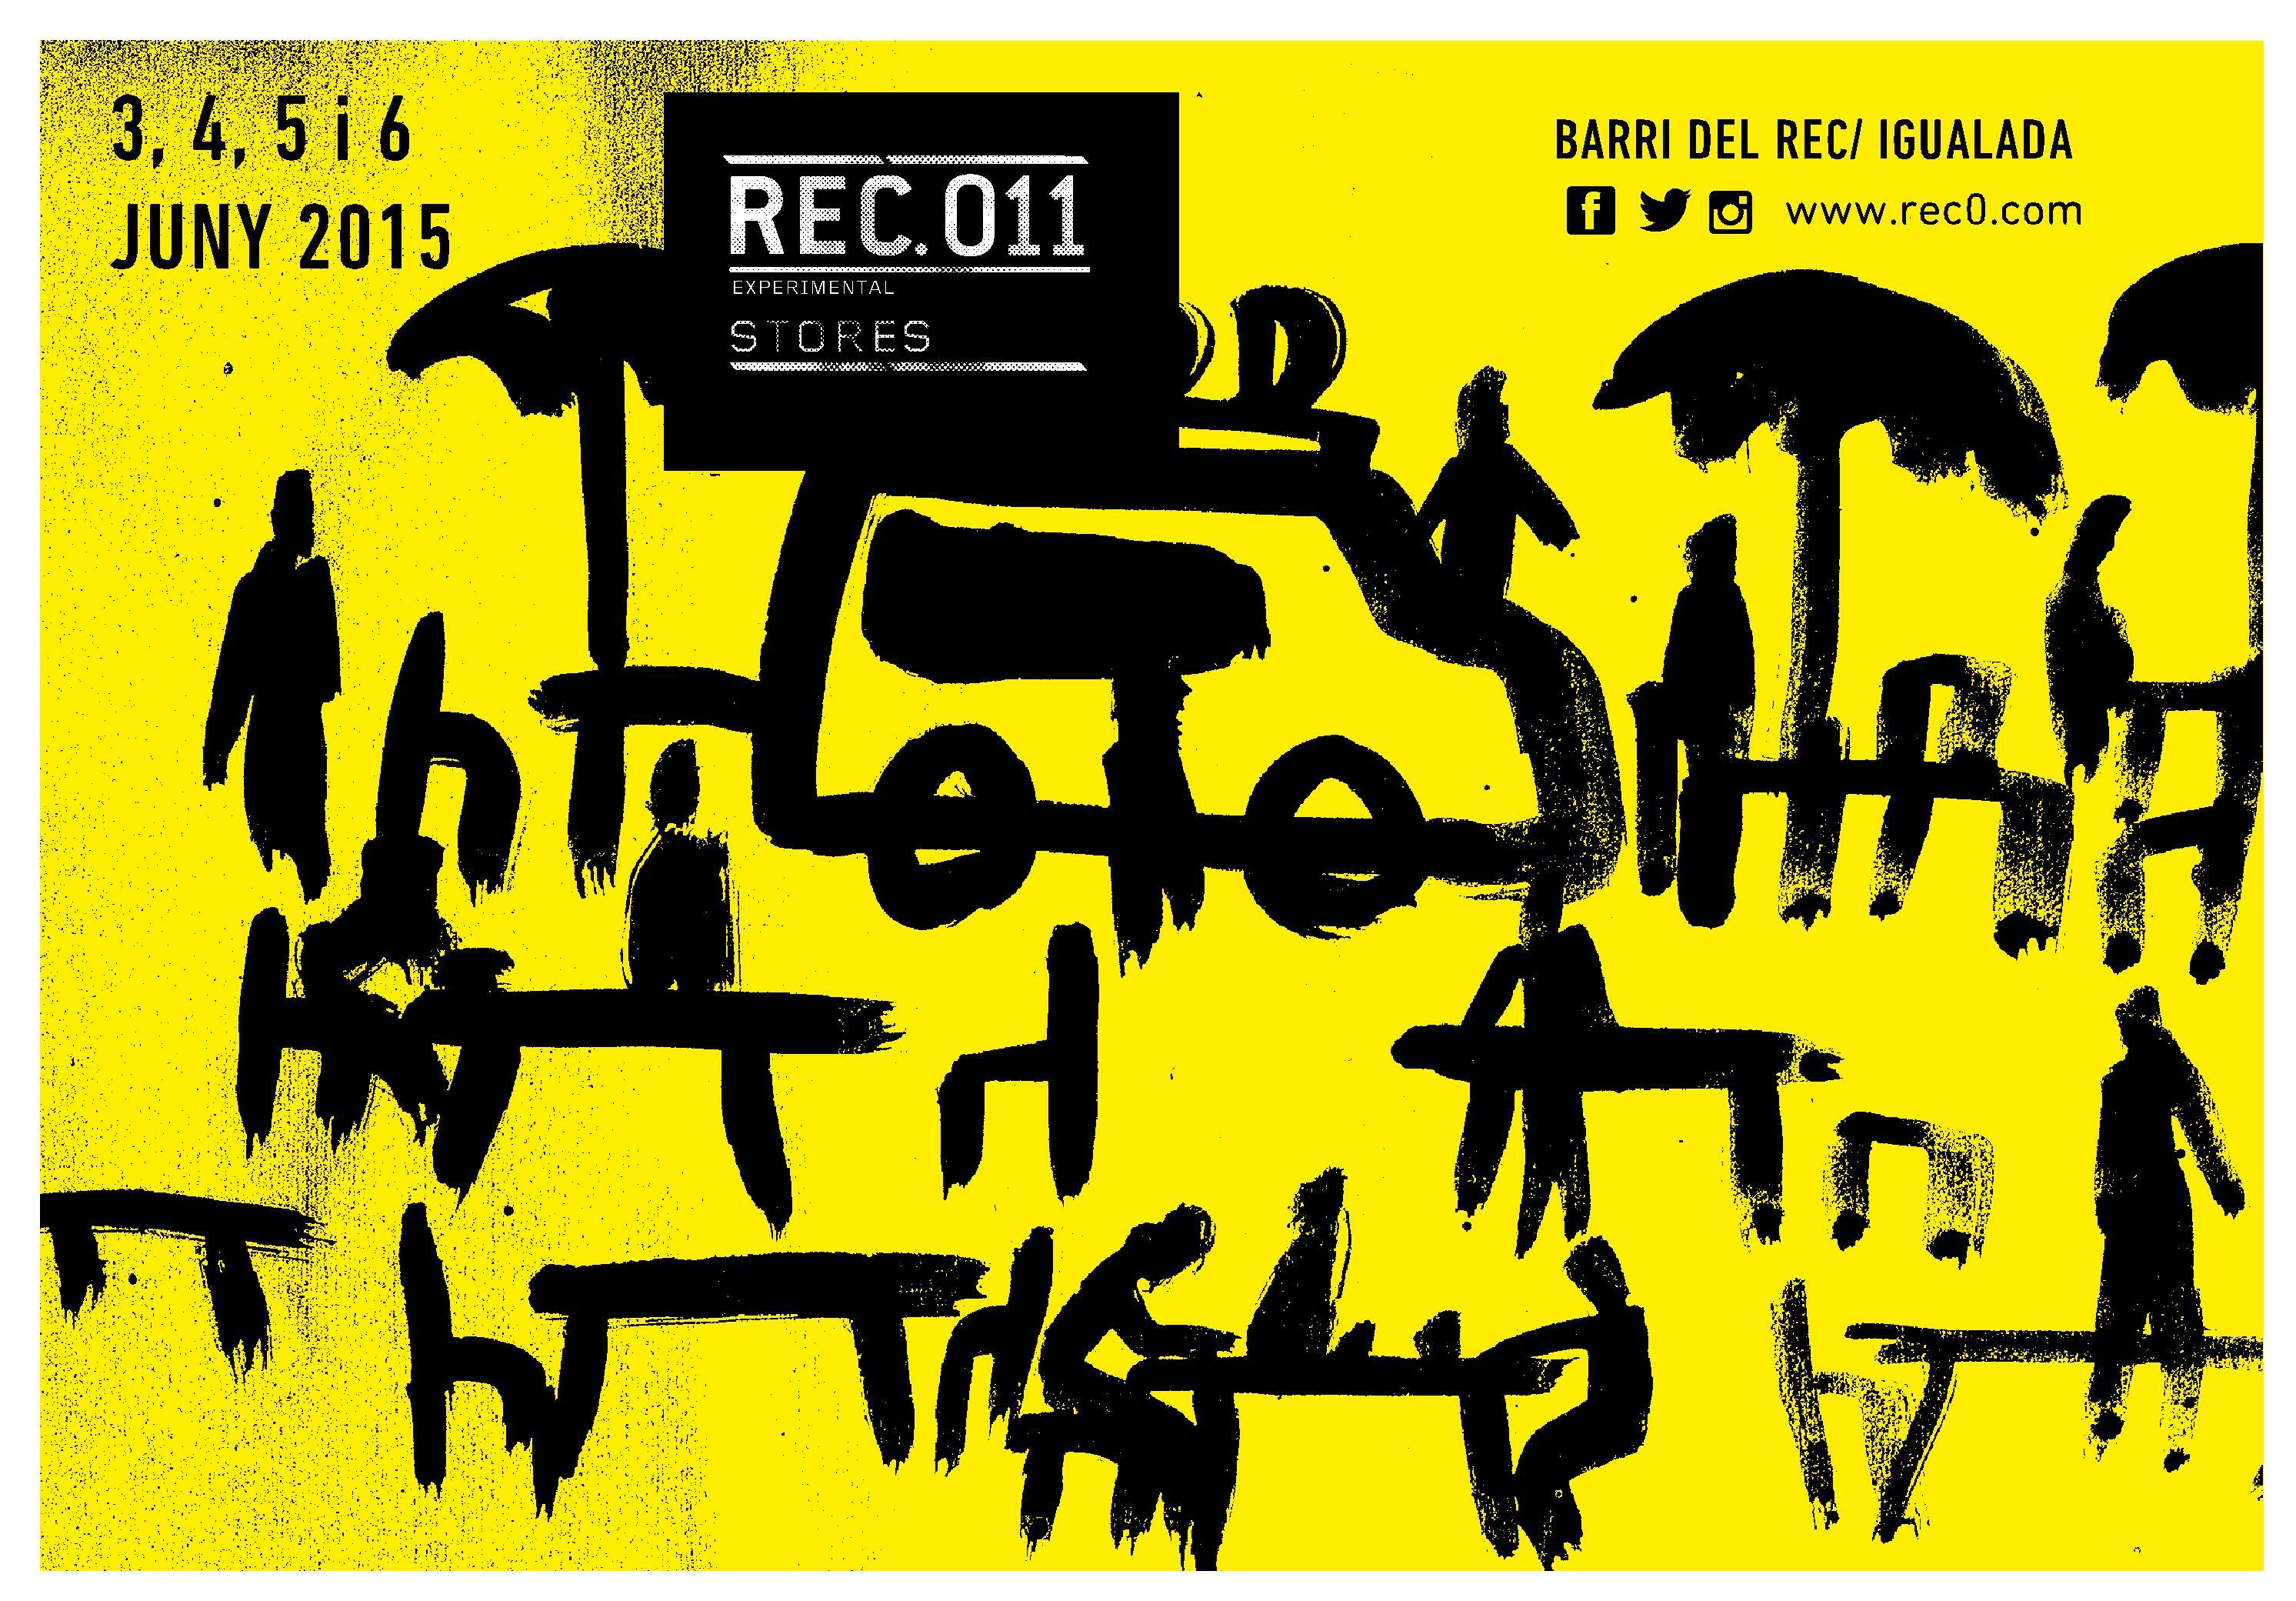 Rec.011 - dates